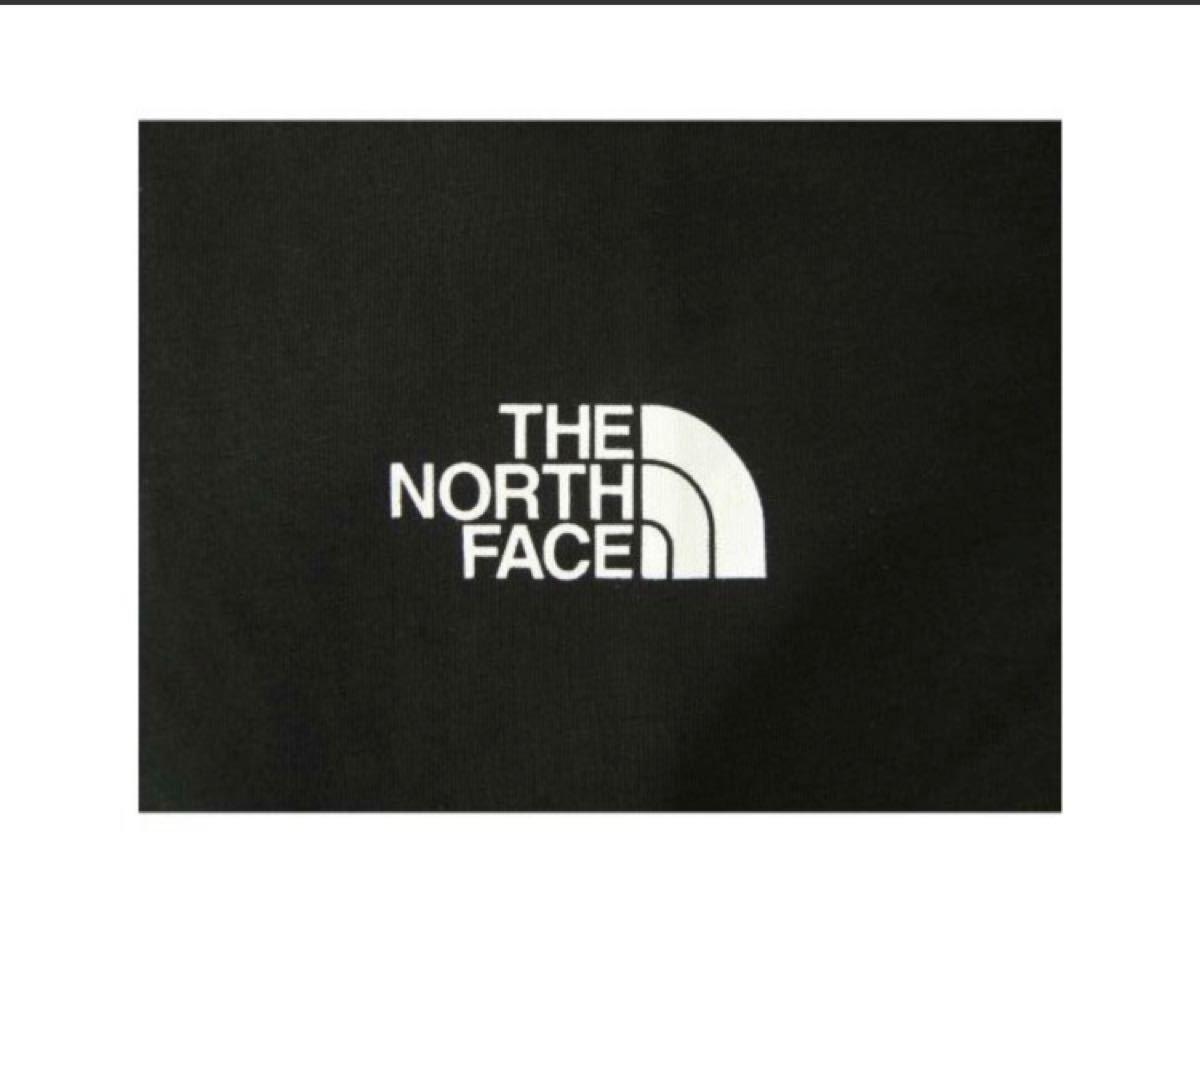 THE NORTH FACE ザノースフェイス Tシャツ NF0A2TX5JK31Mサイズ